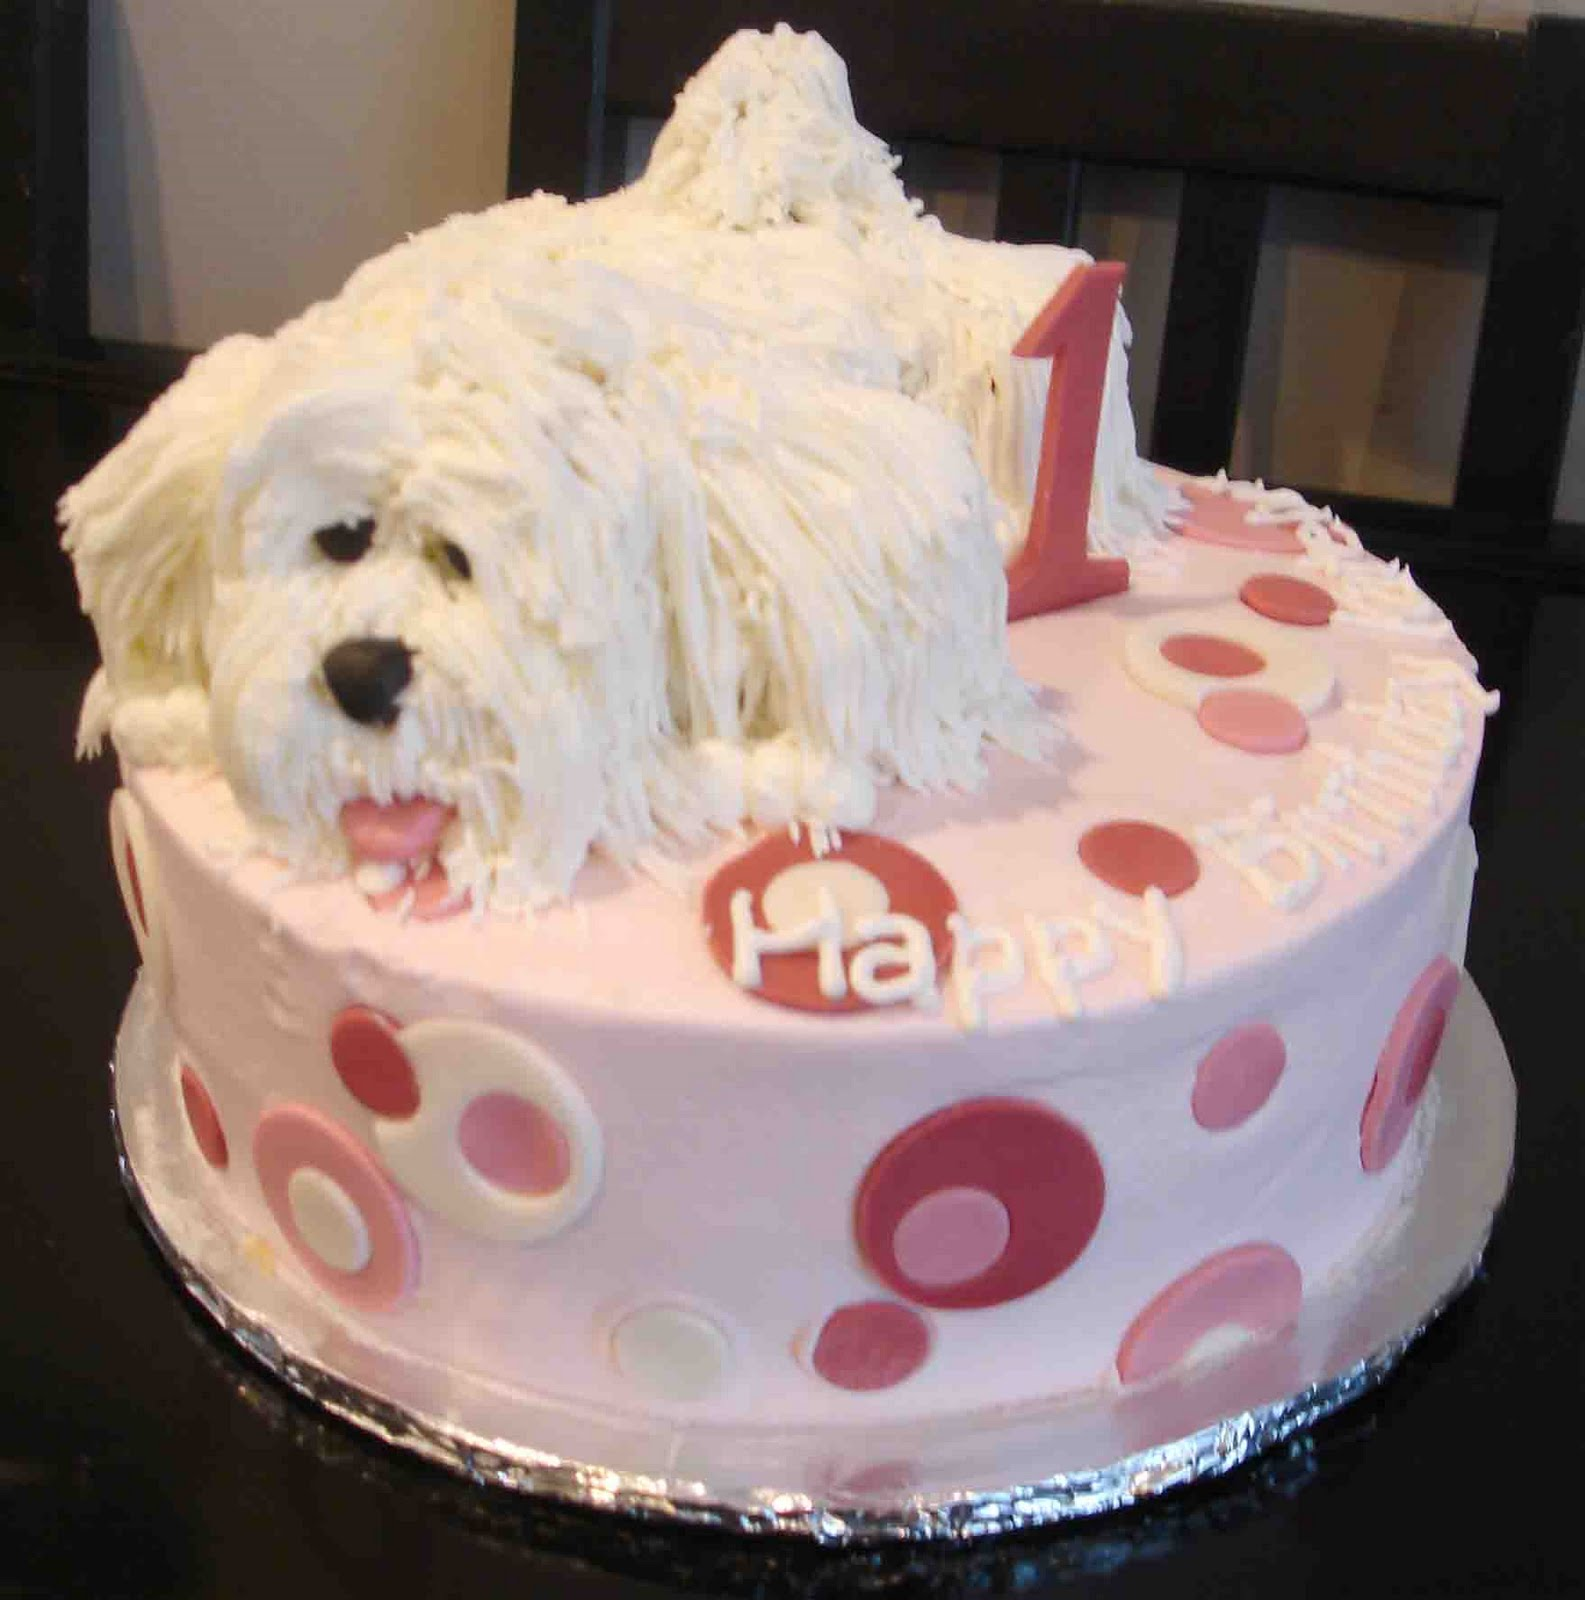 Serendipity Cake Design Puppy Cake